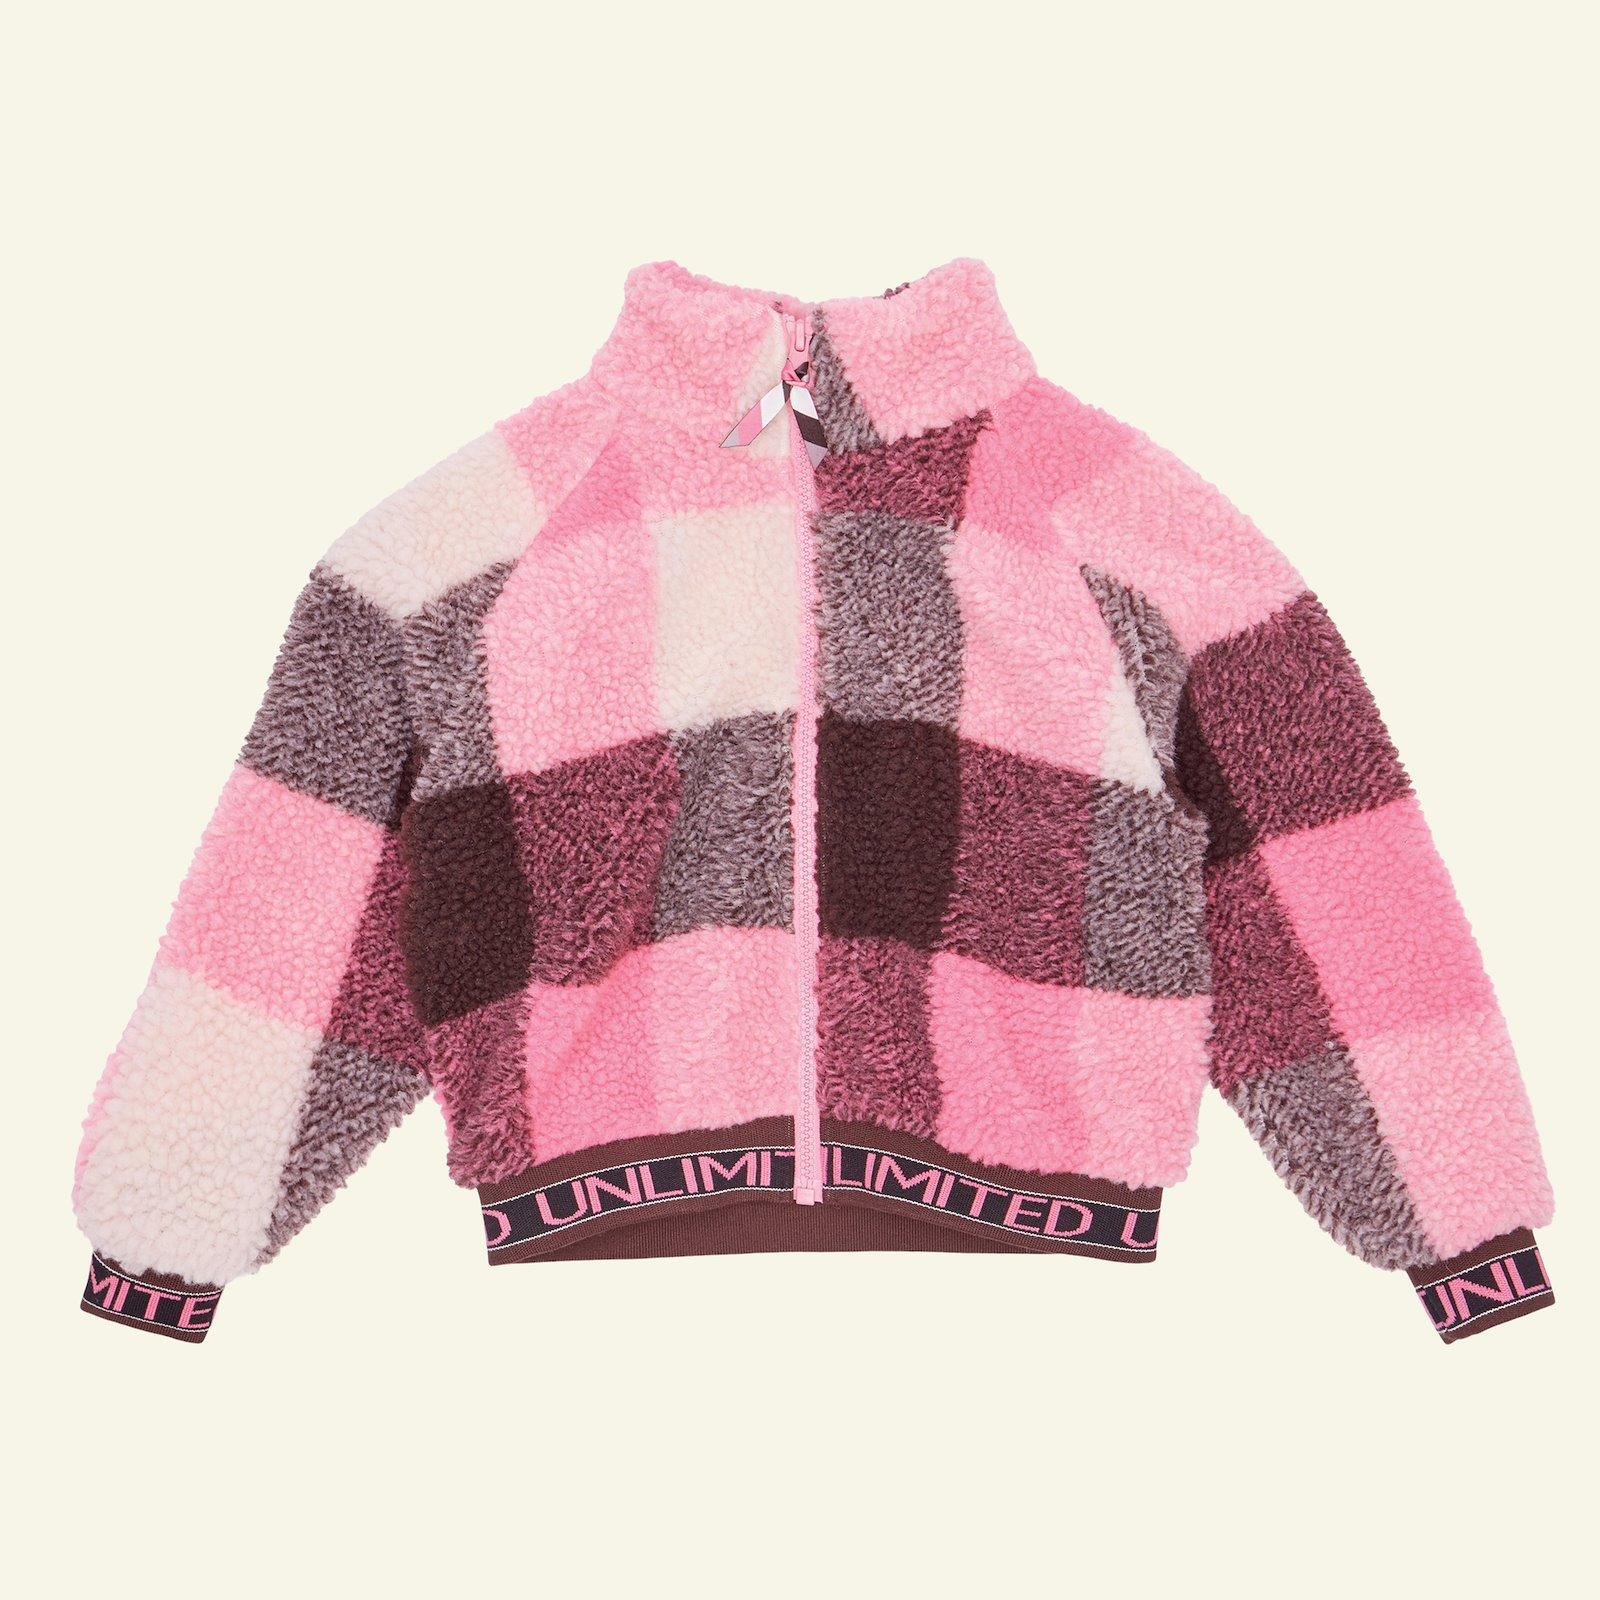 Anorak and jacket, 128/8y p64020_910277_96184_sskit